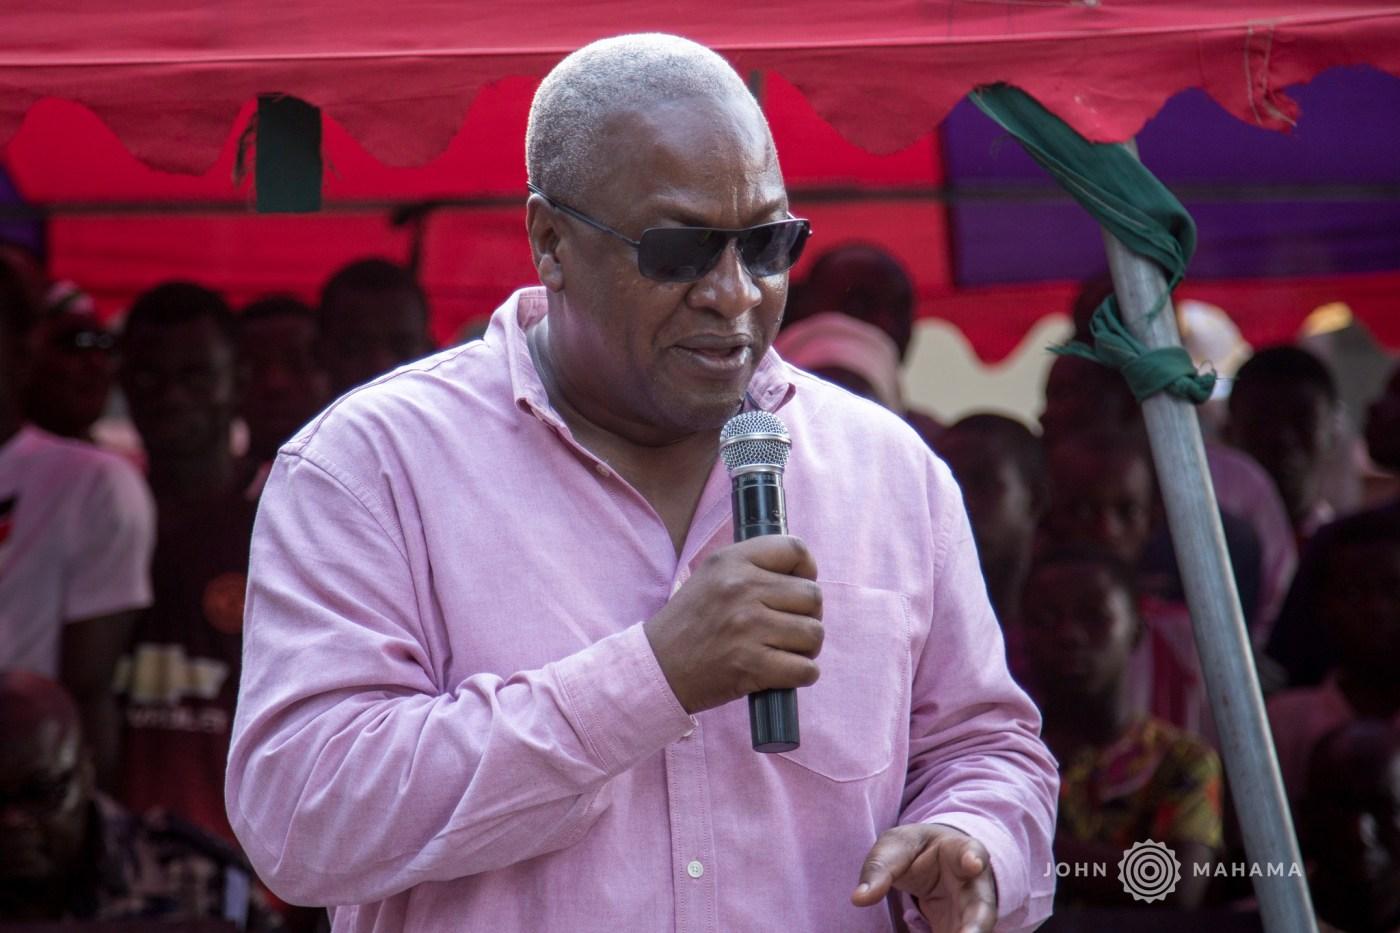 Suspending Tempane SHS head wrong, NPP is intolerant – Mahama